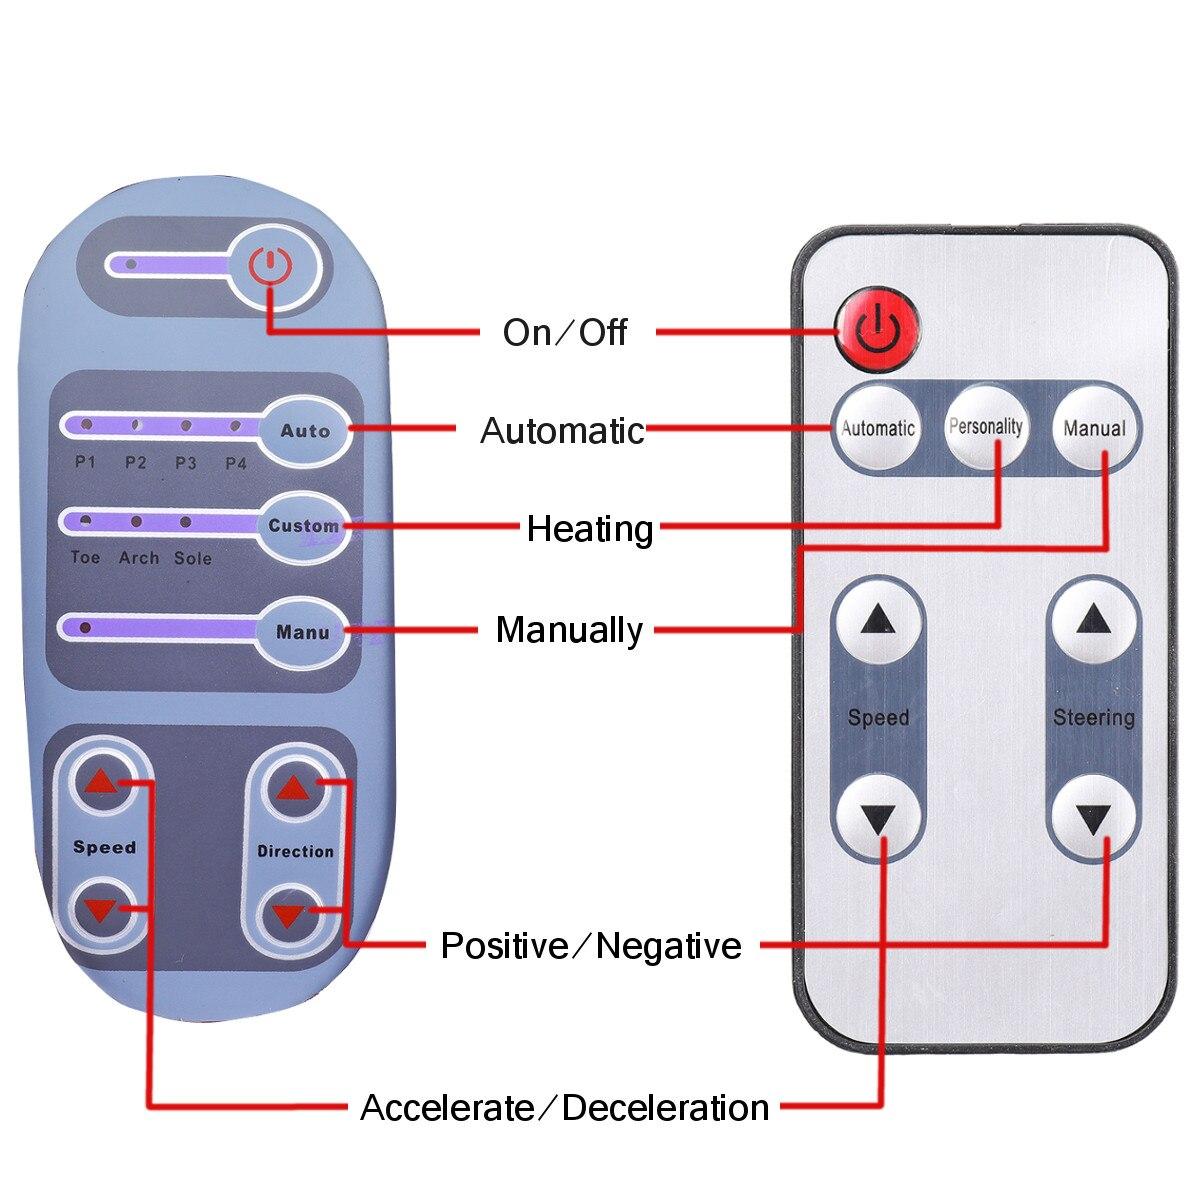 Electric Heating Foot Body Leg Massager Shiatsu Kneading Roller Vibrator Machine Reflexology Calf Leg Pain Relief Relax 220V New